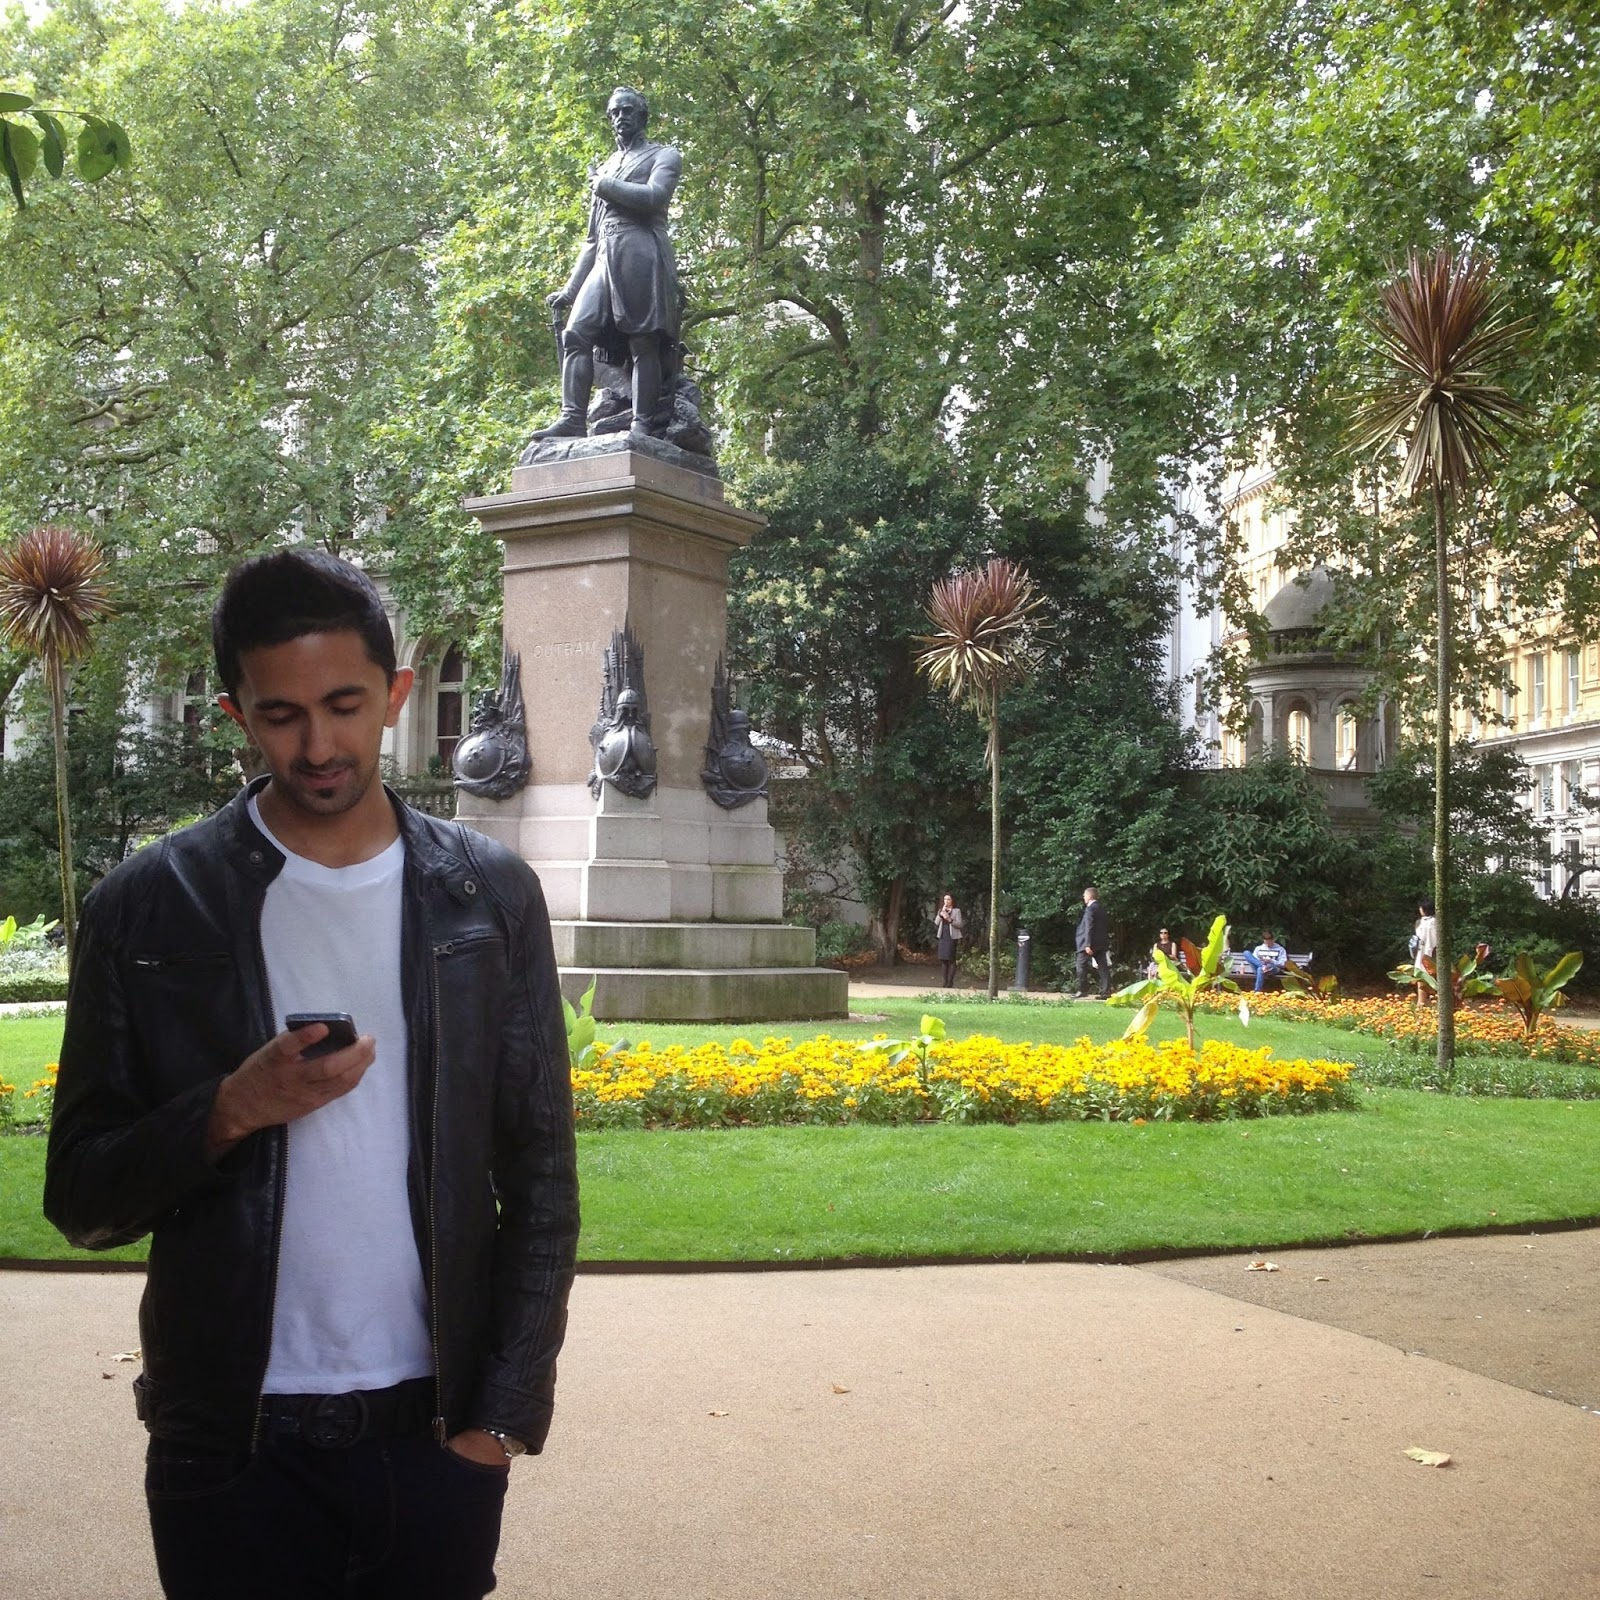 london gardens and memorial